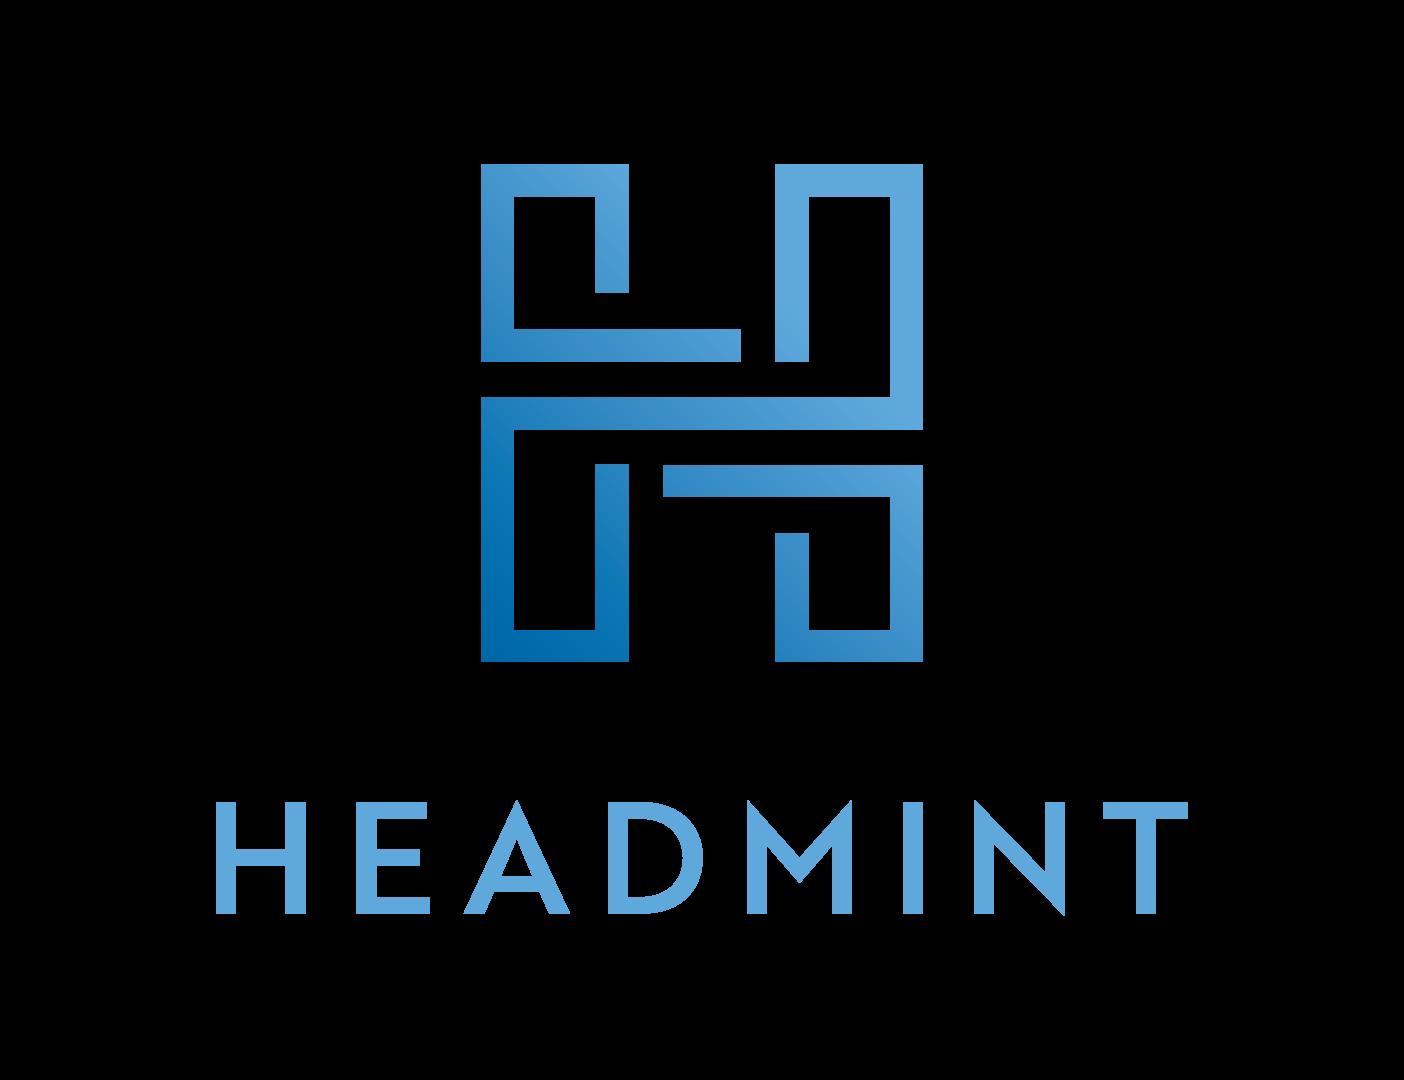 H-logo-primary-dark-logo.png